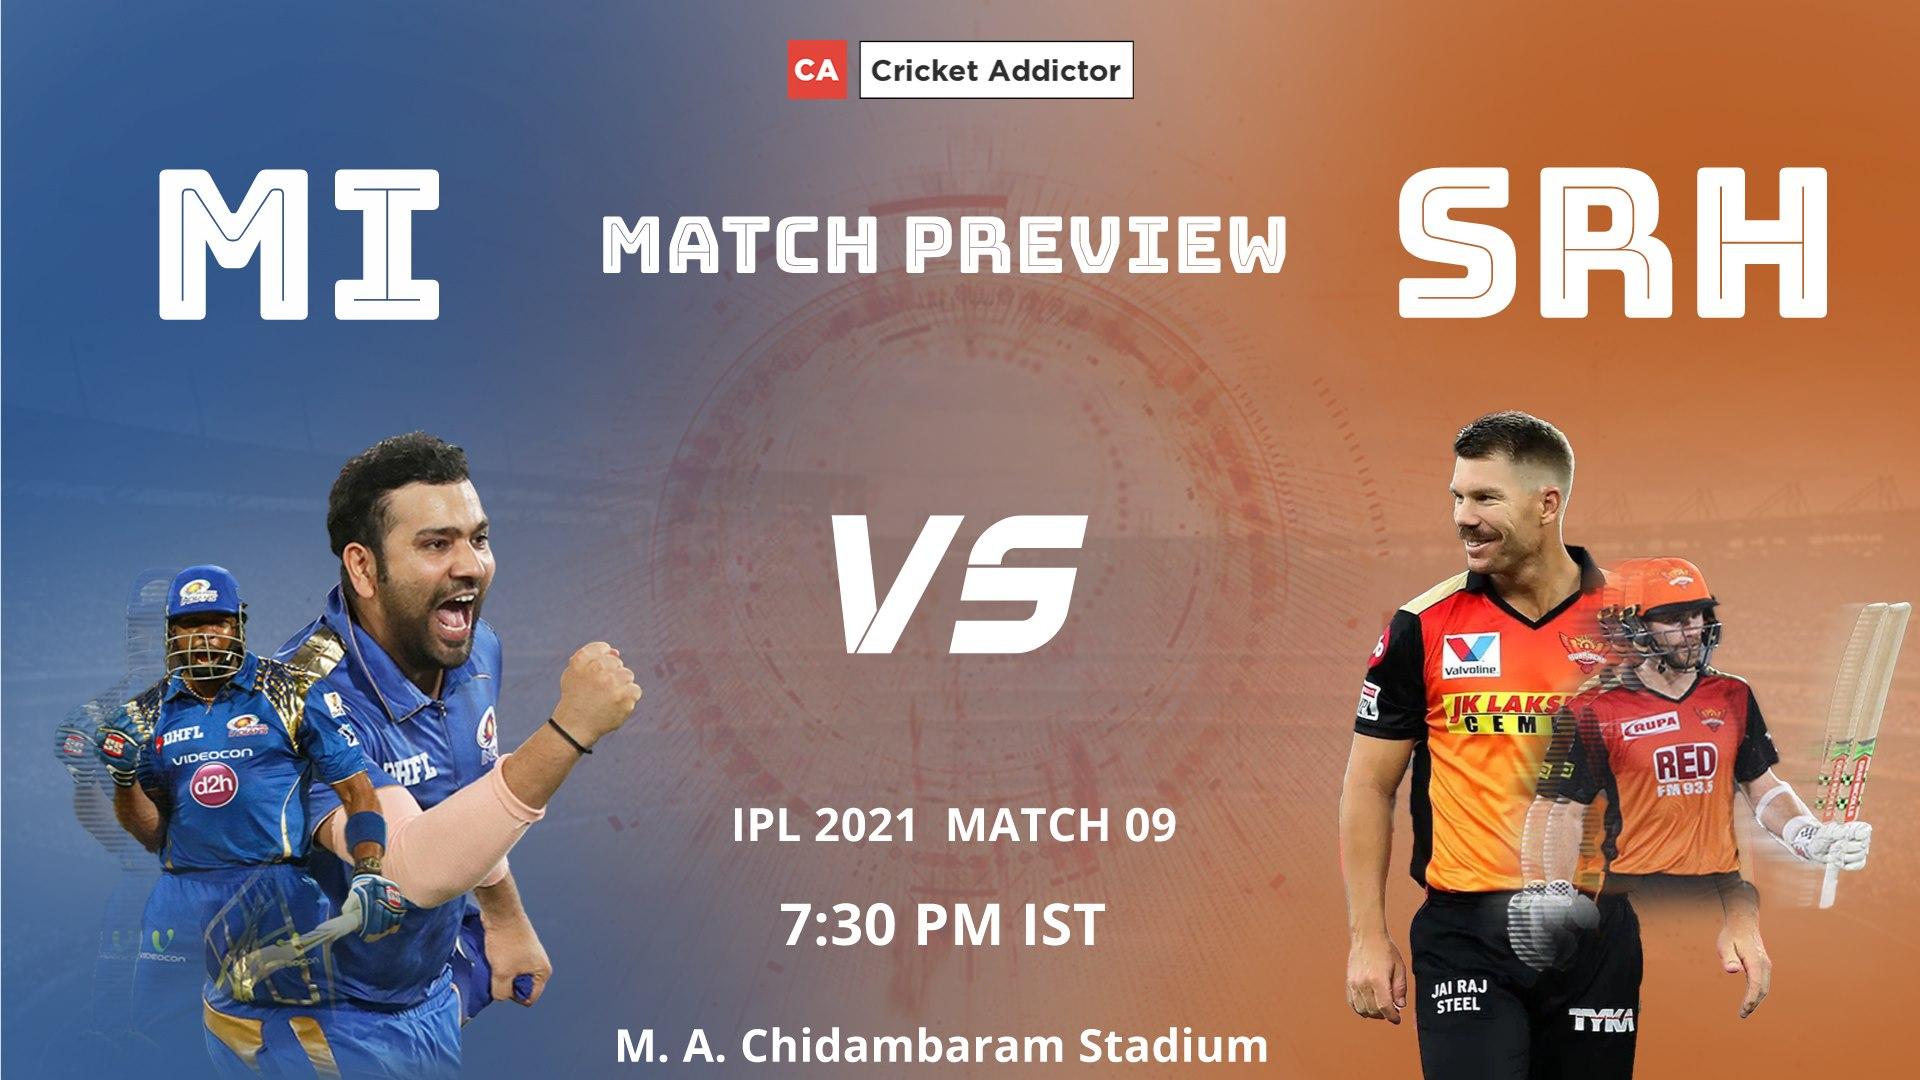 IPL 2021, Mumbai Indians, SunRisers Hyderabad, MI vs SRH, Match Preview, Prediction